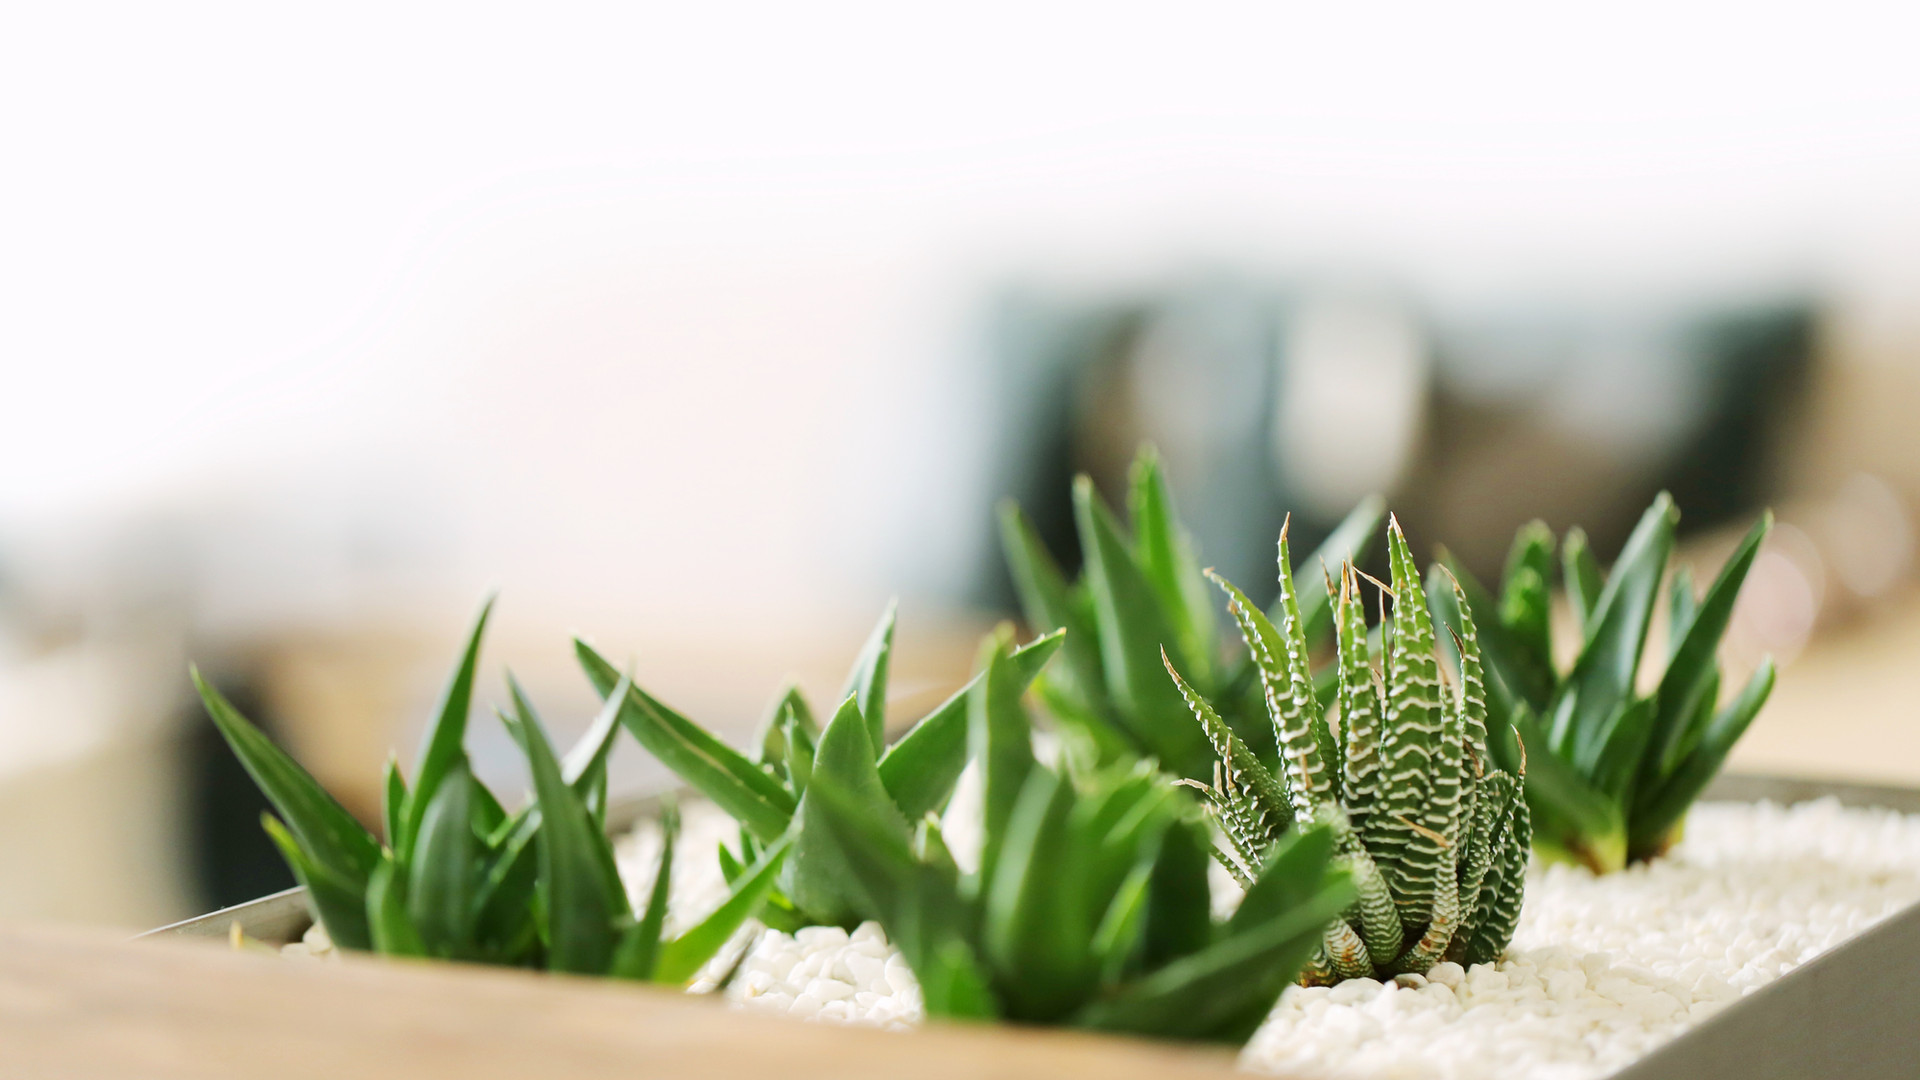 Pequenas plantas verdes